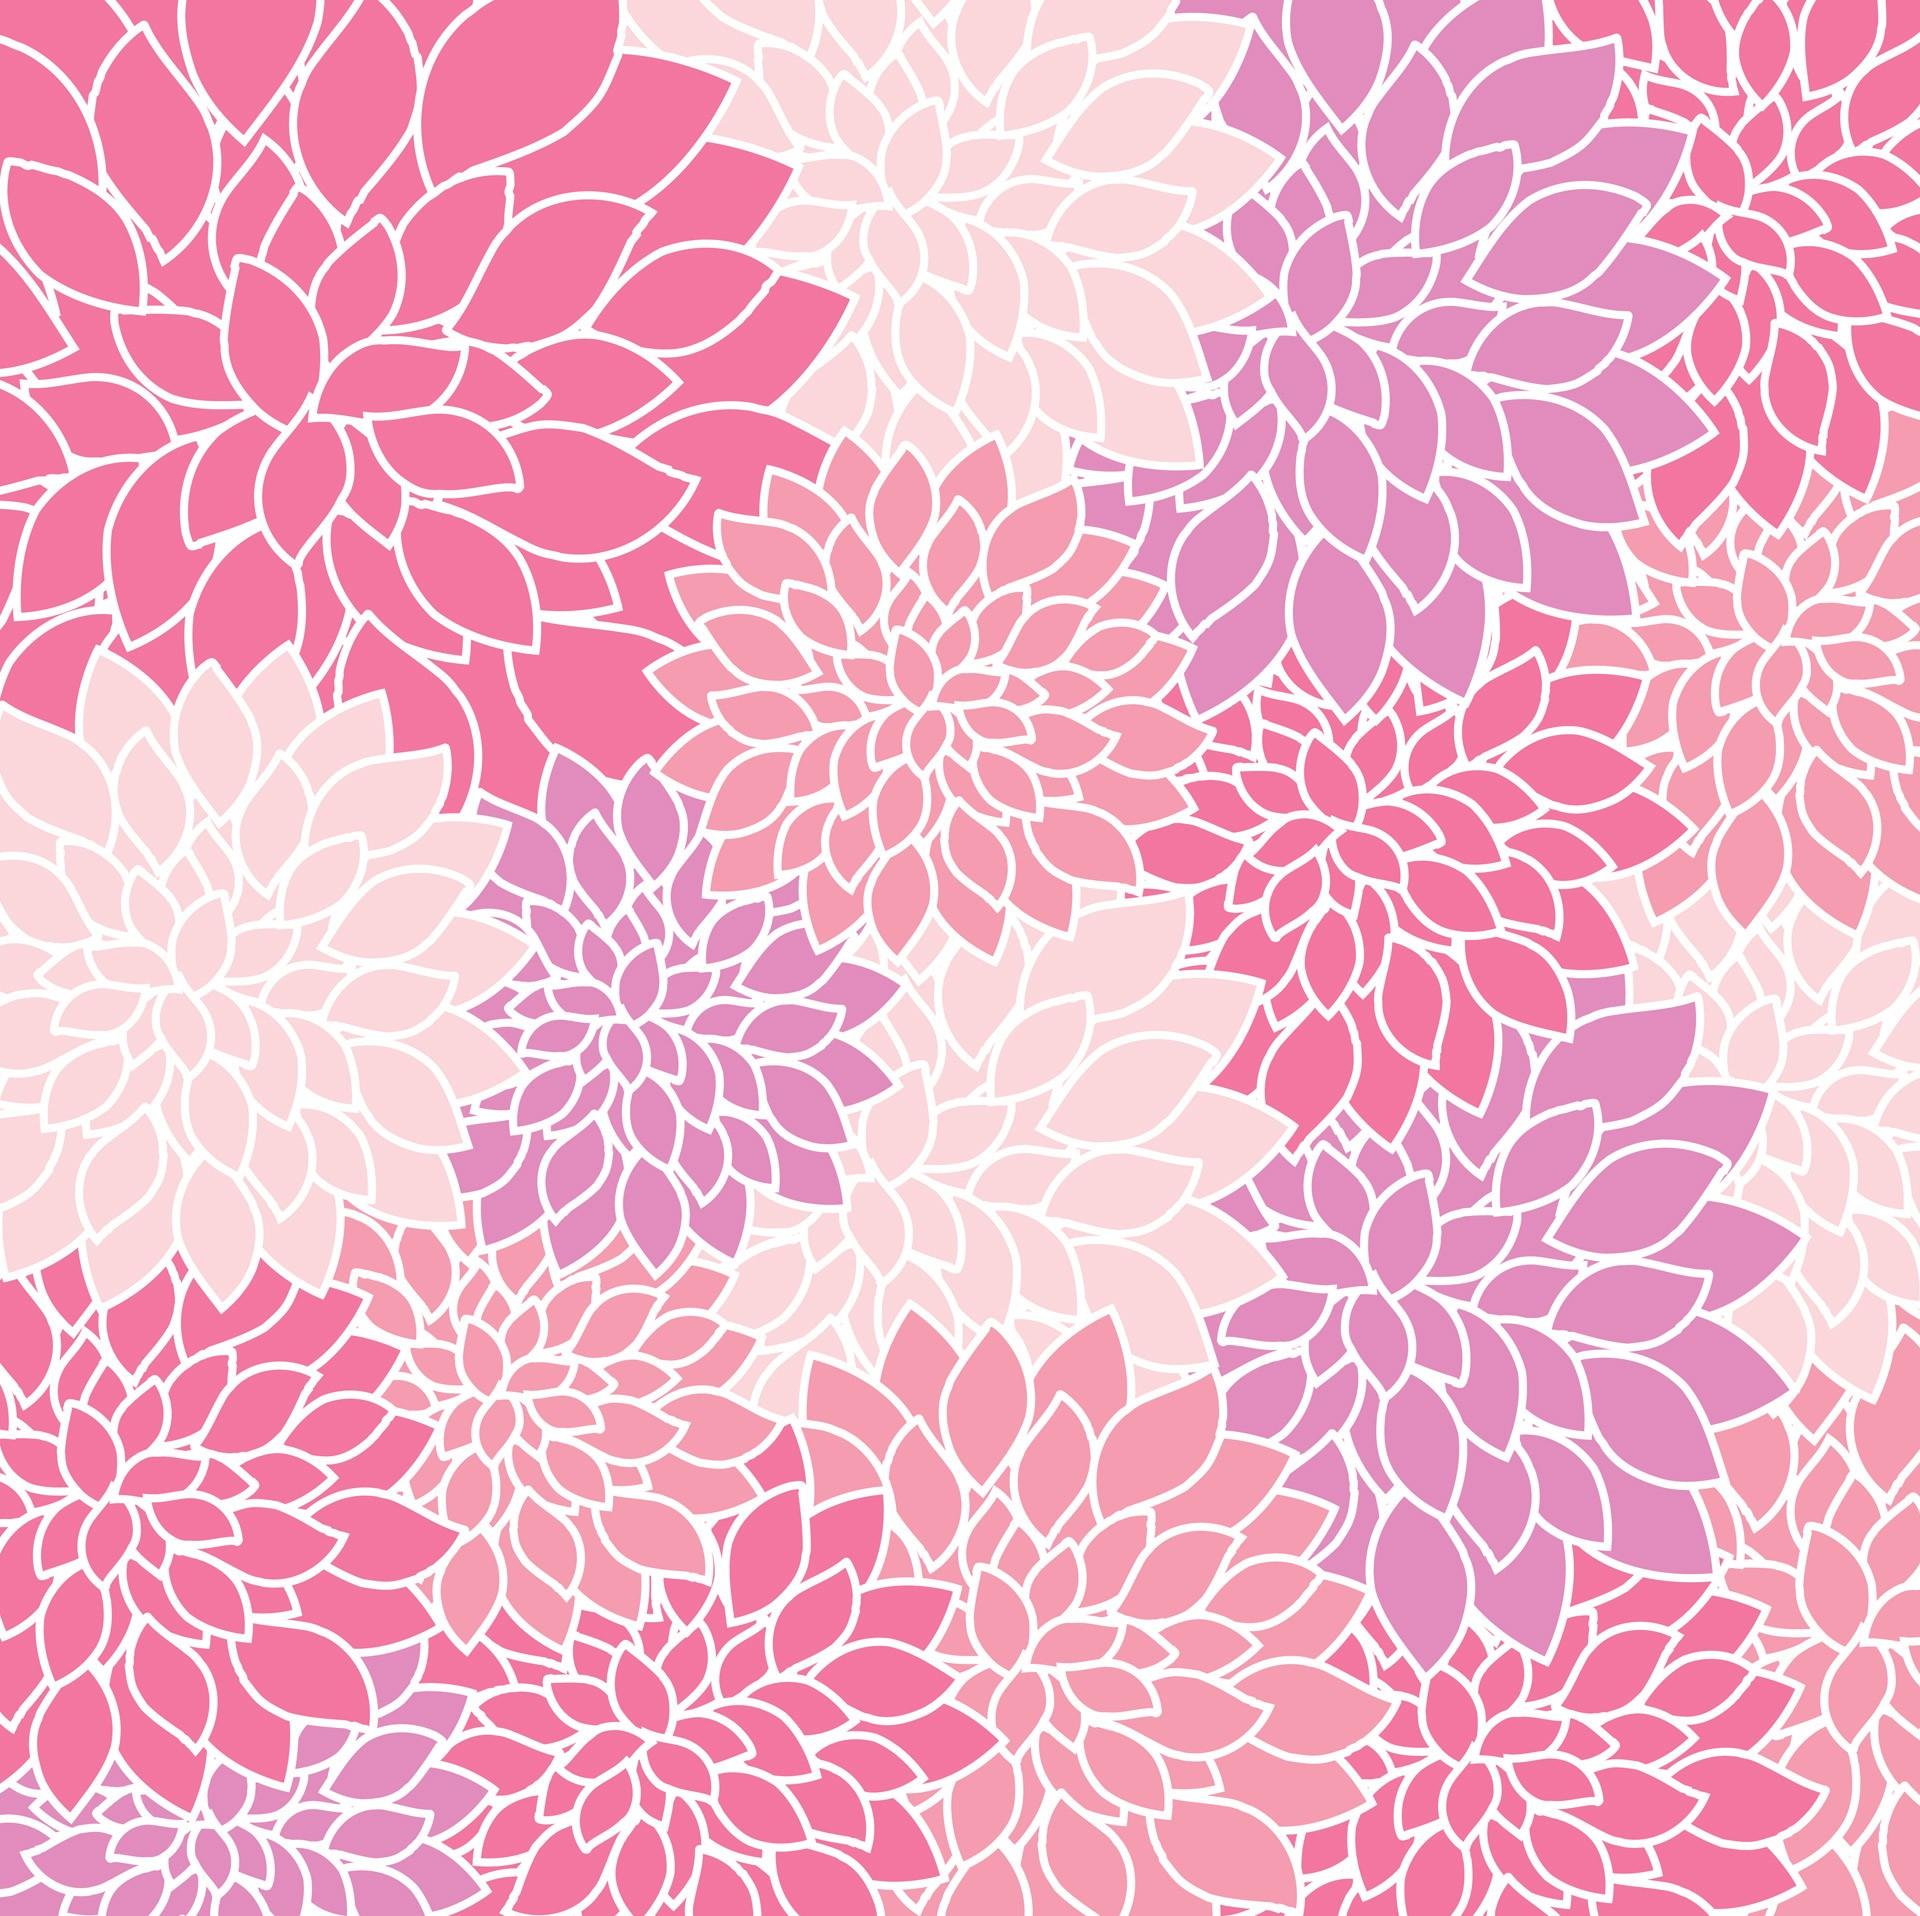 Vintage Floral Wallpaper ·① Download Free Cool High